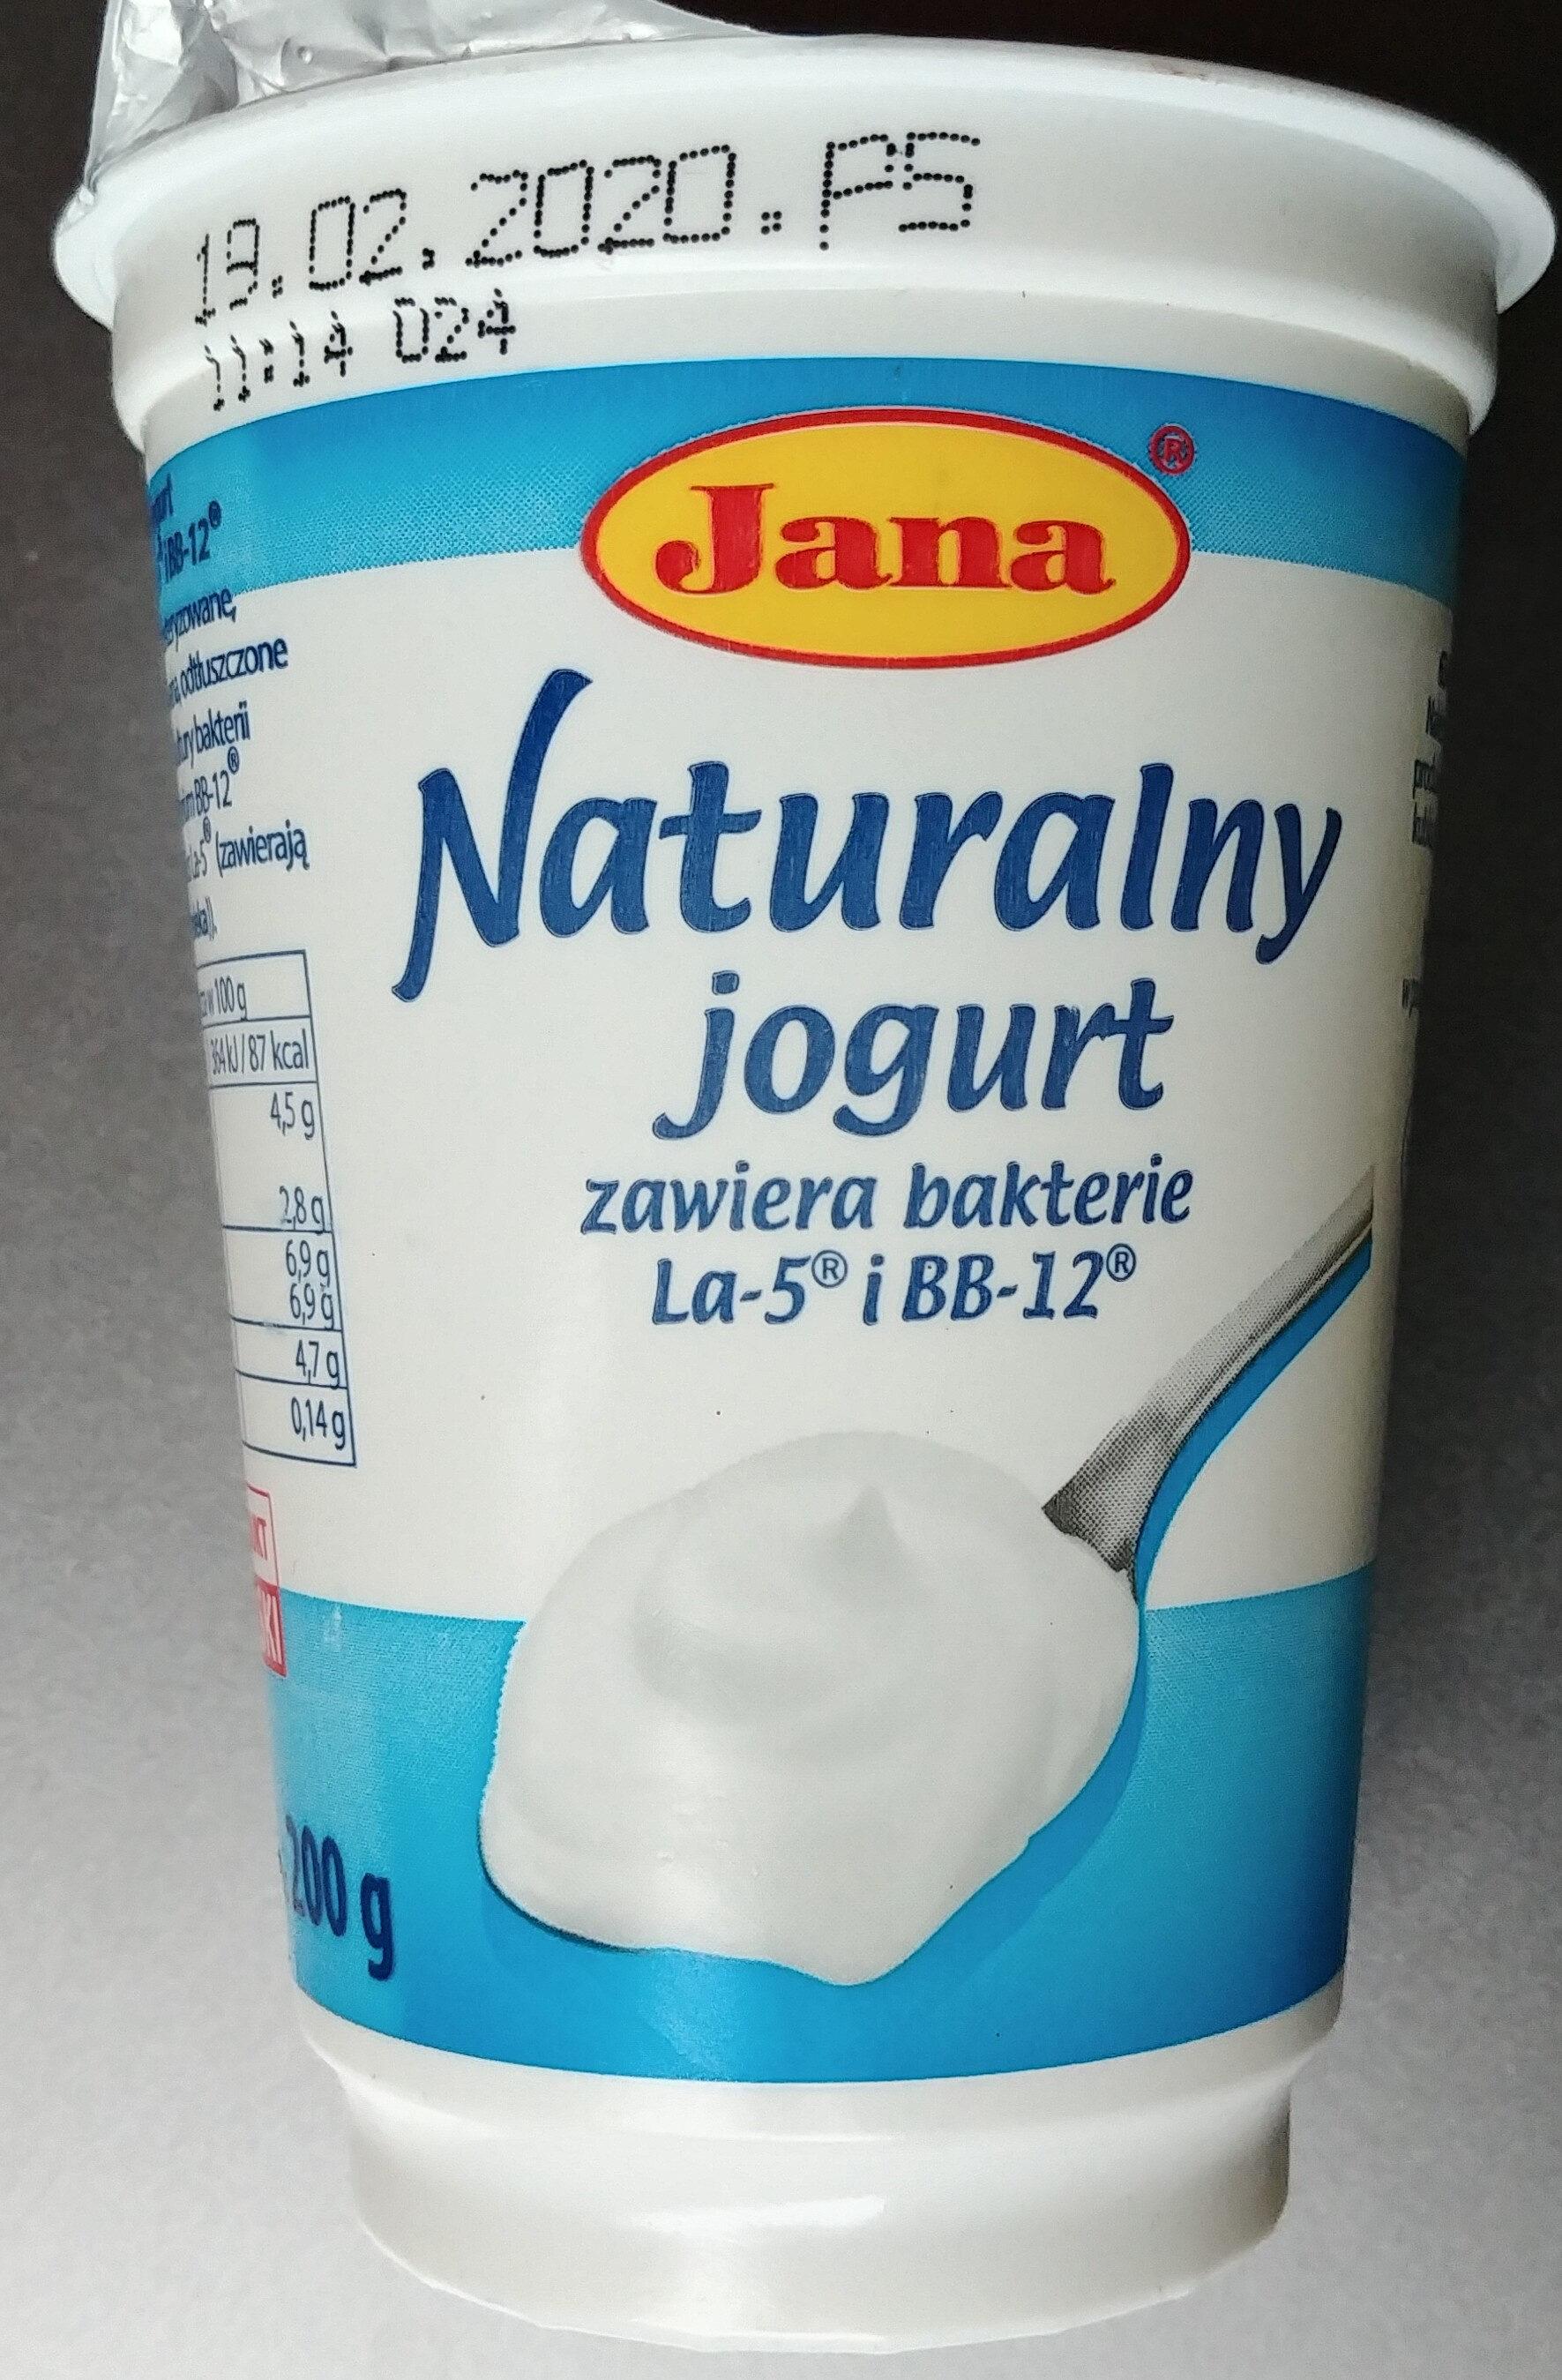 Jogurt naturalny - Product - pl